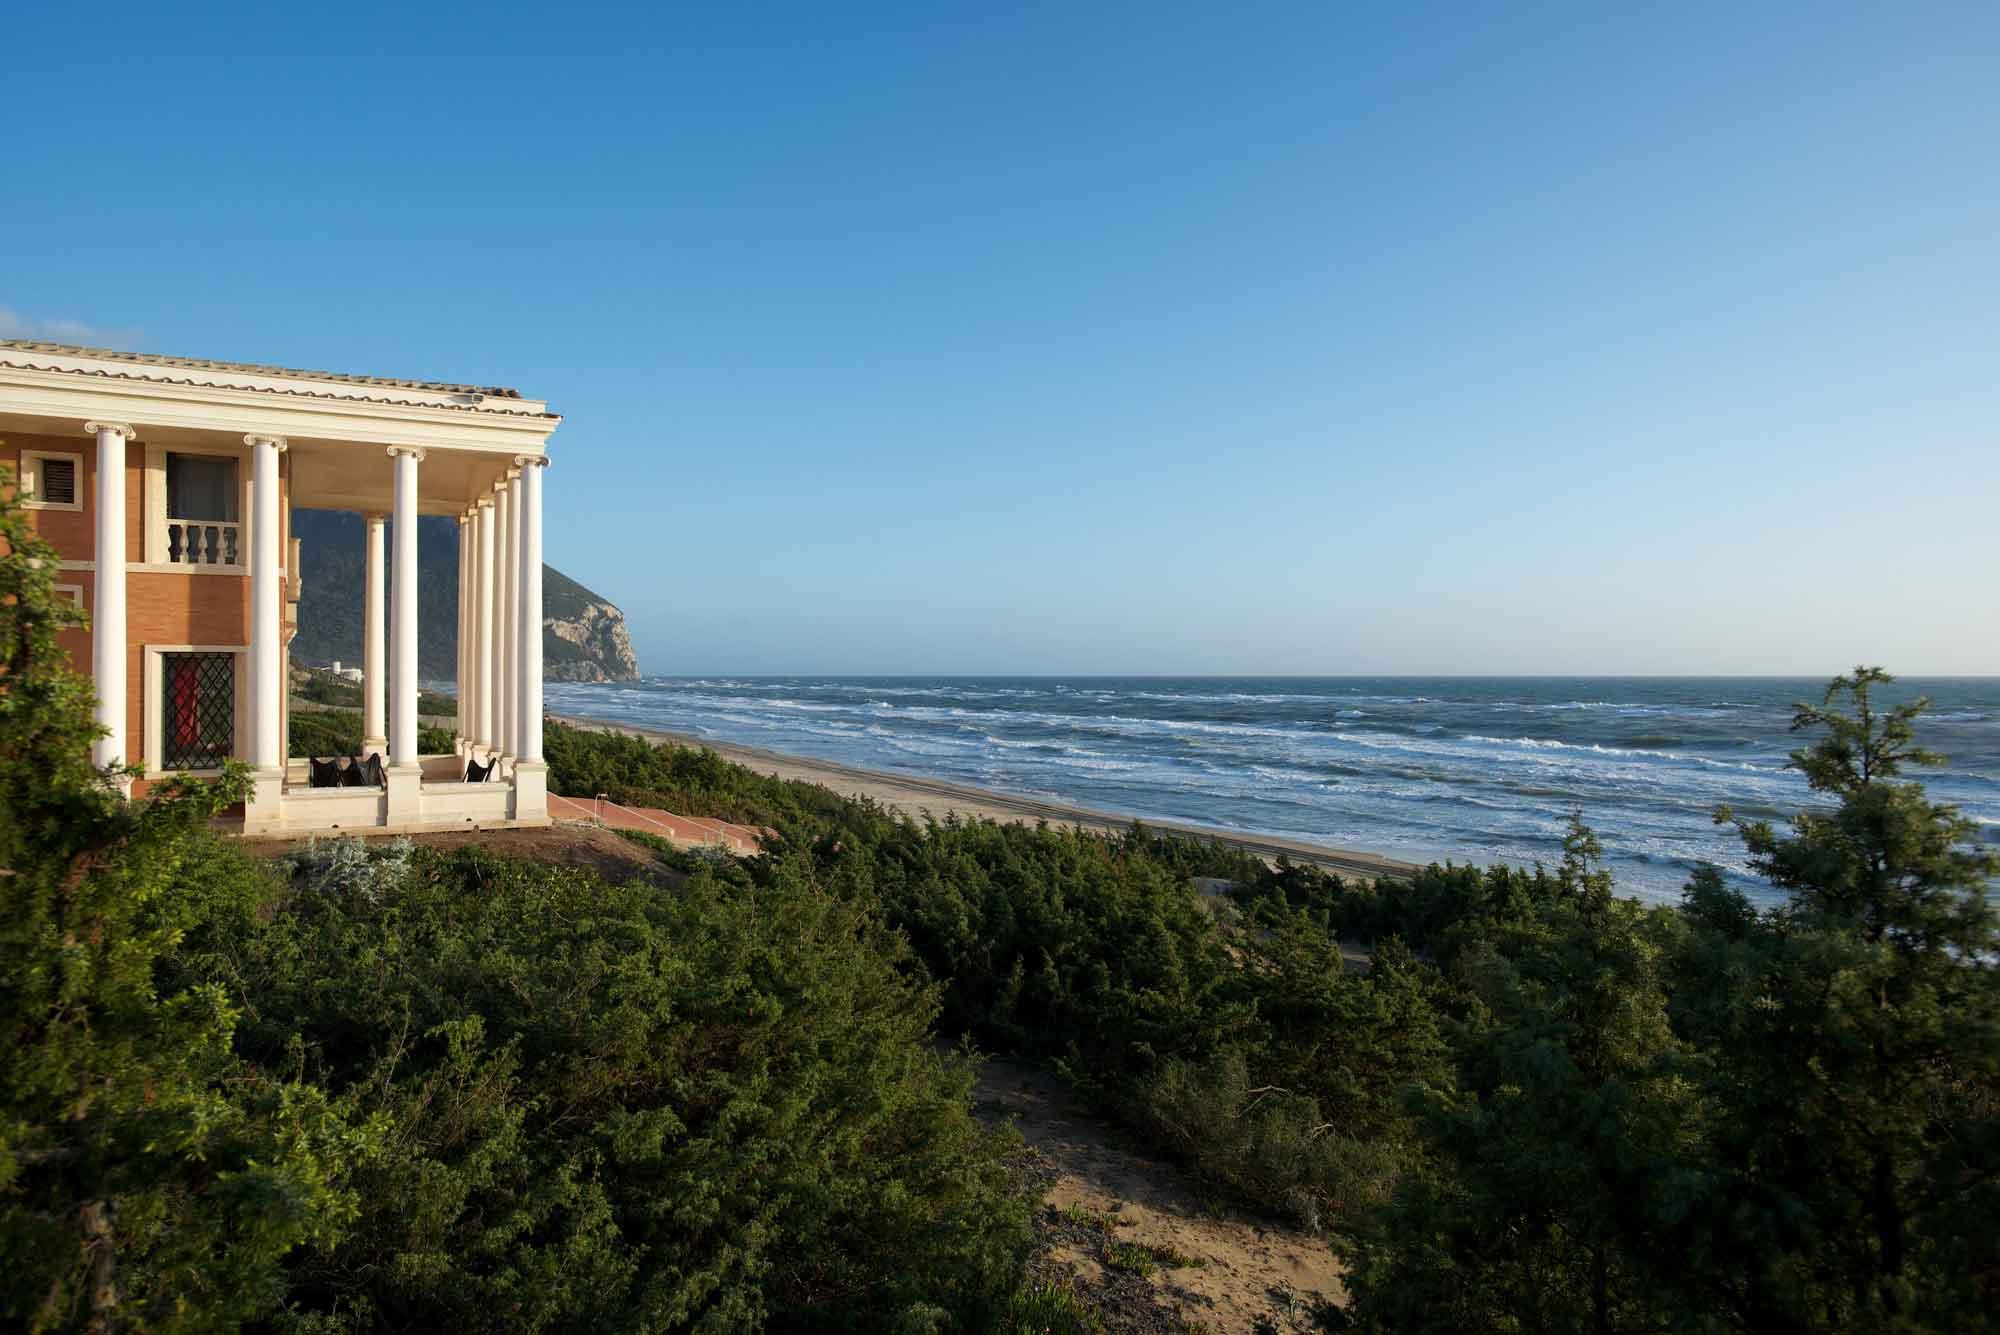 Villa Volpi is a triumph of design on the shores of the Tyrrhenian Sea, near the Roman resort town of Sabaudia.